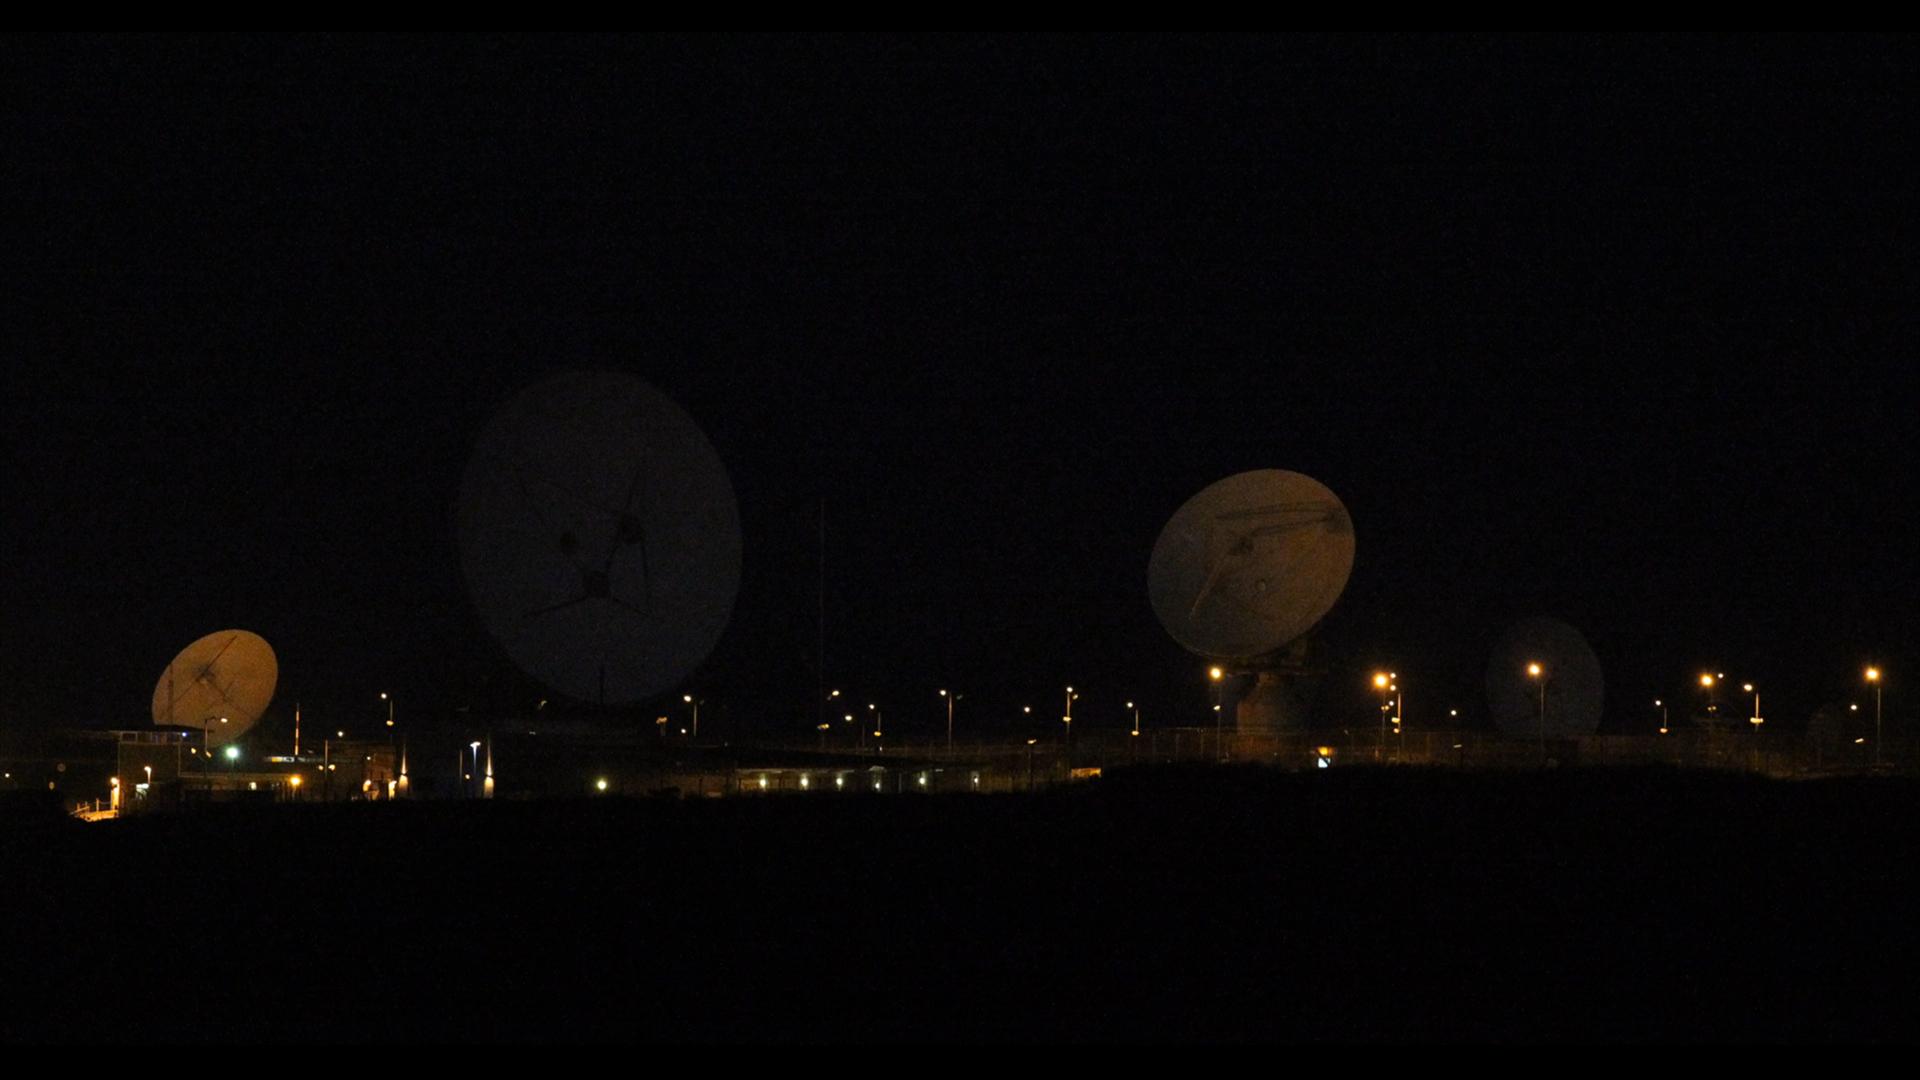 GCHQ satellites in Bude, England